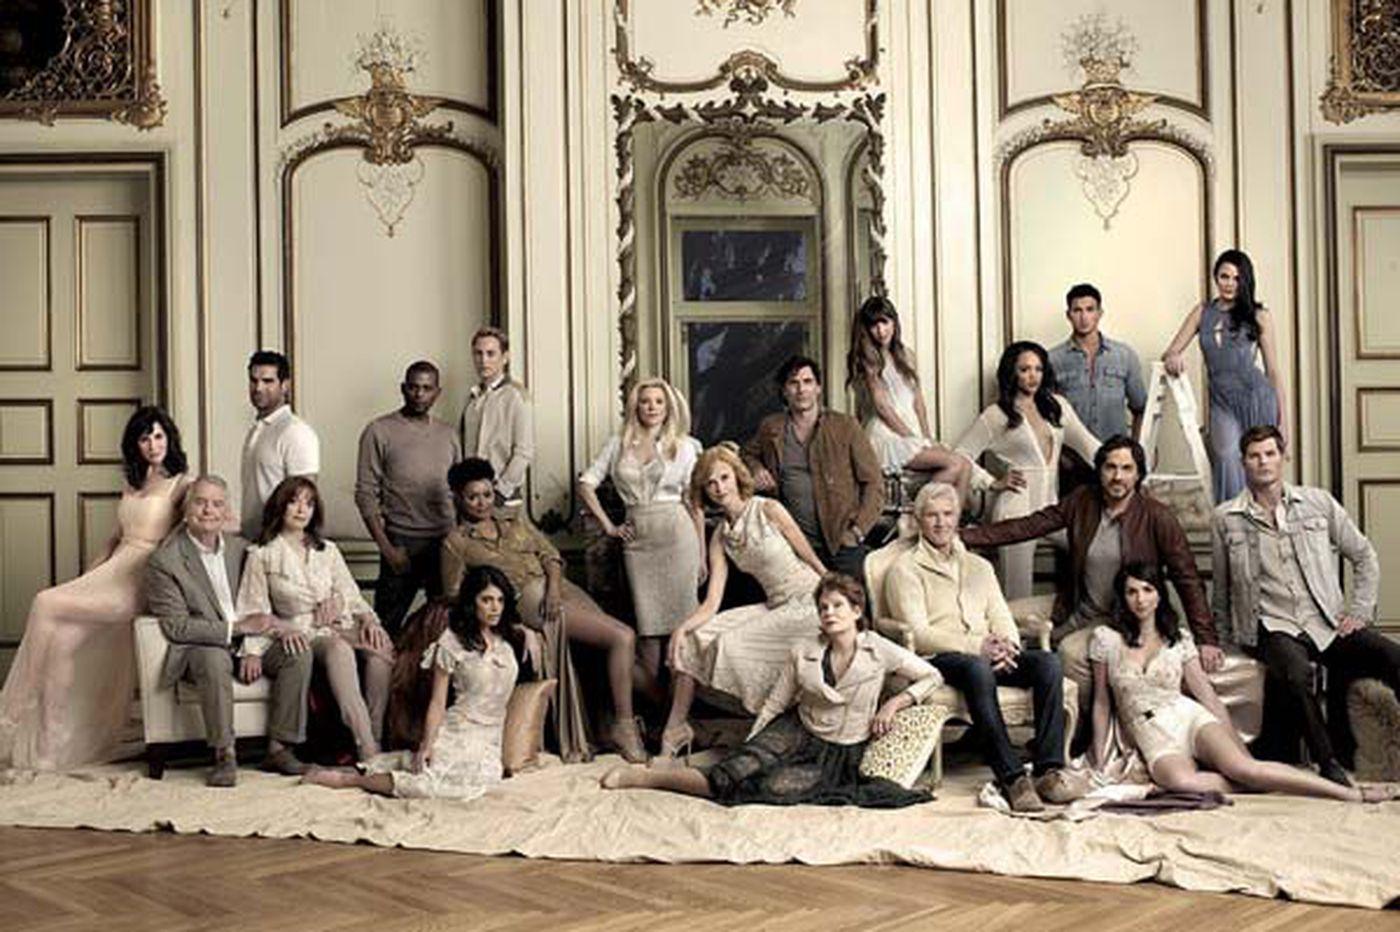 Classic soaps 'Children,' 'One Life' reborn online